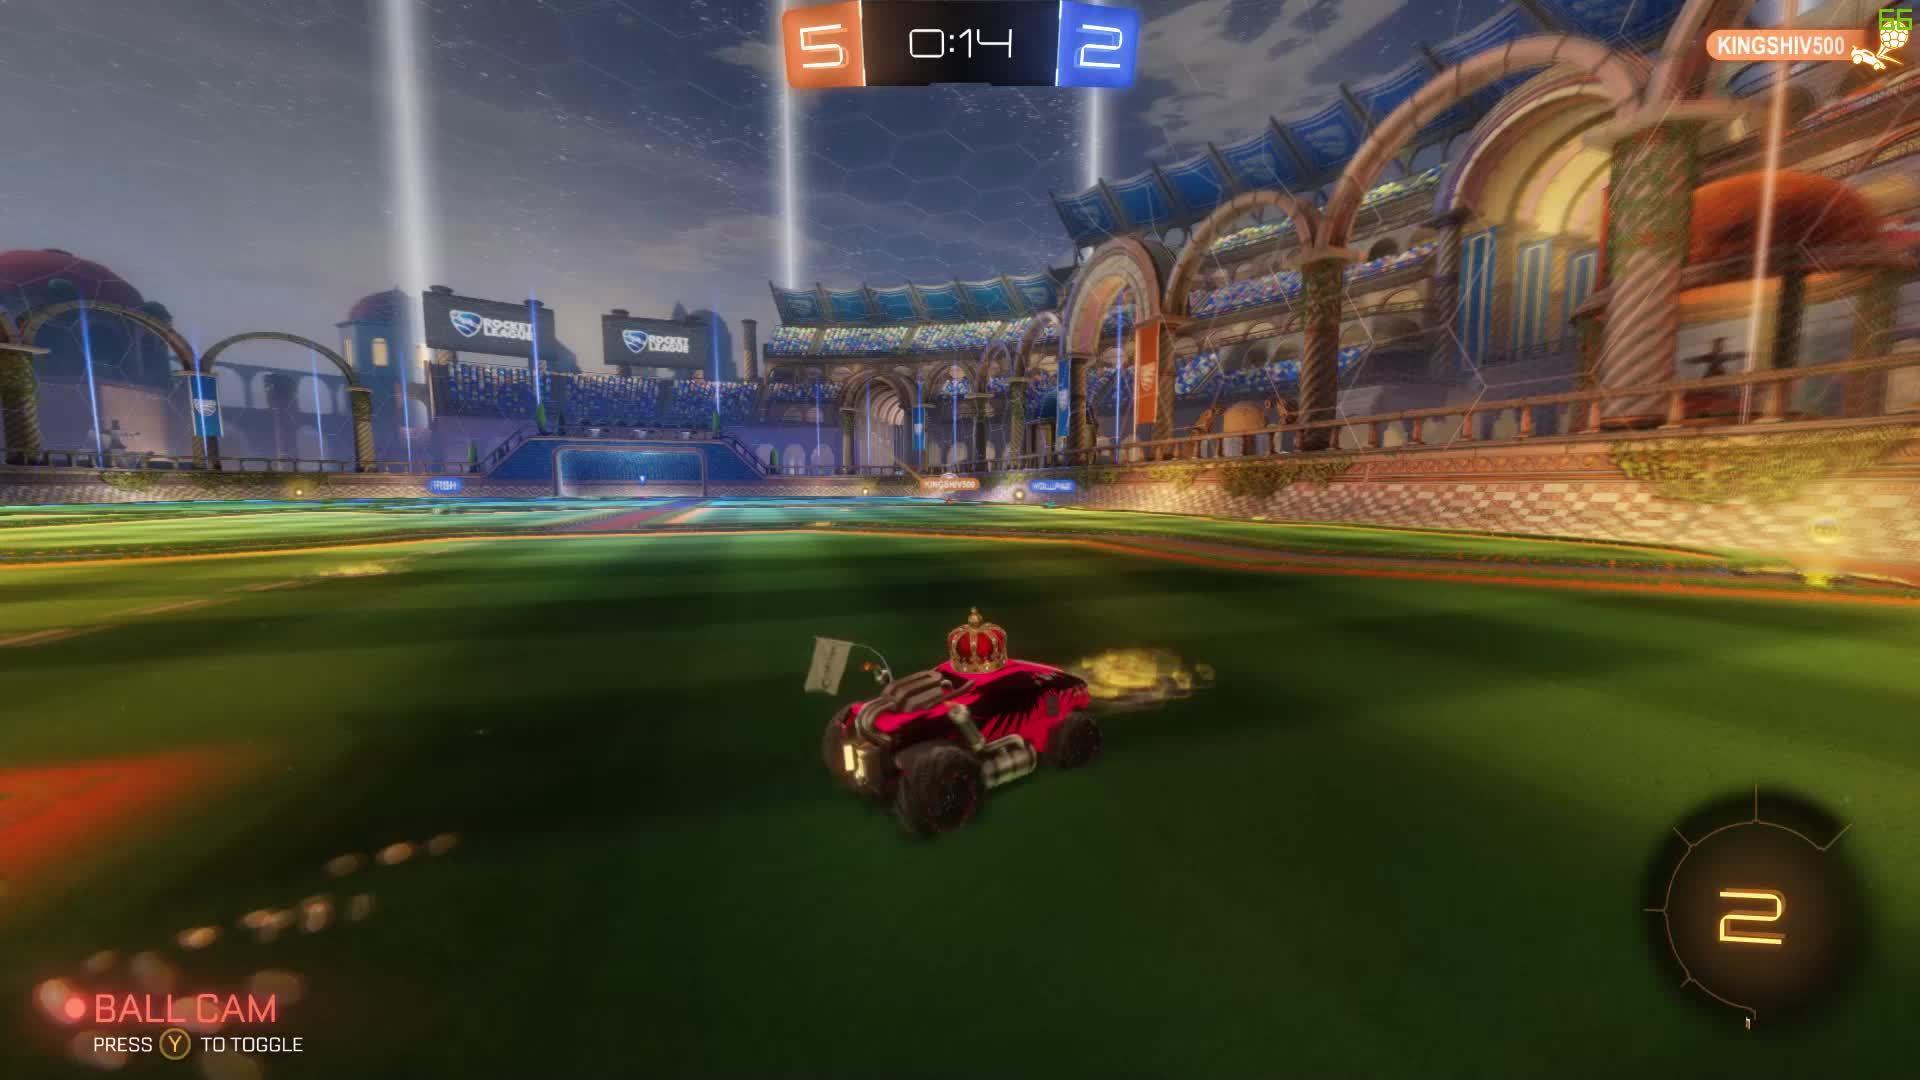 Rocket League, RocketLeague, gaming, RocketLeague GIFs